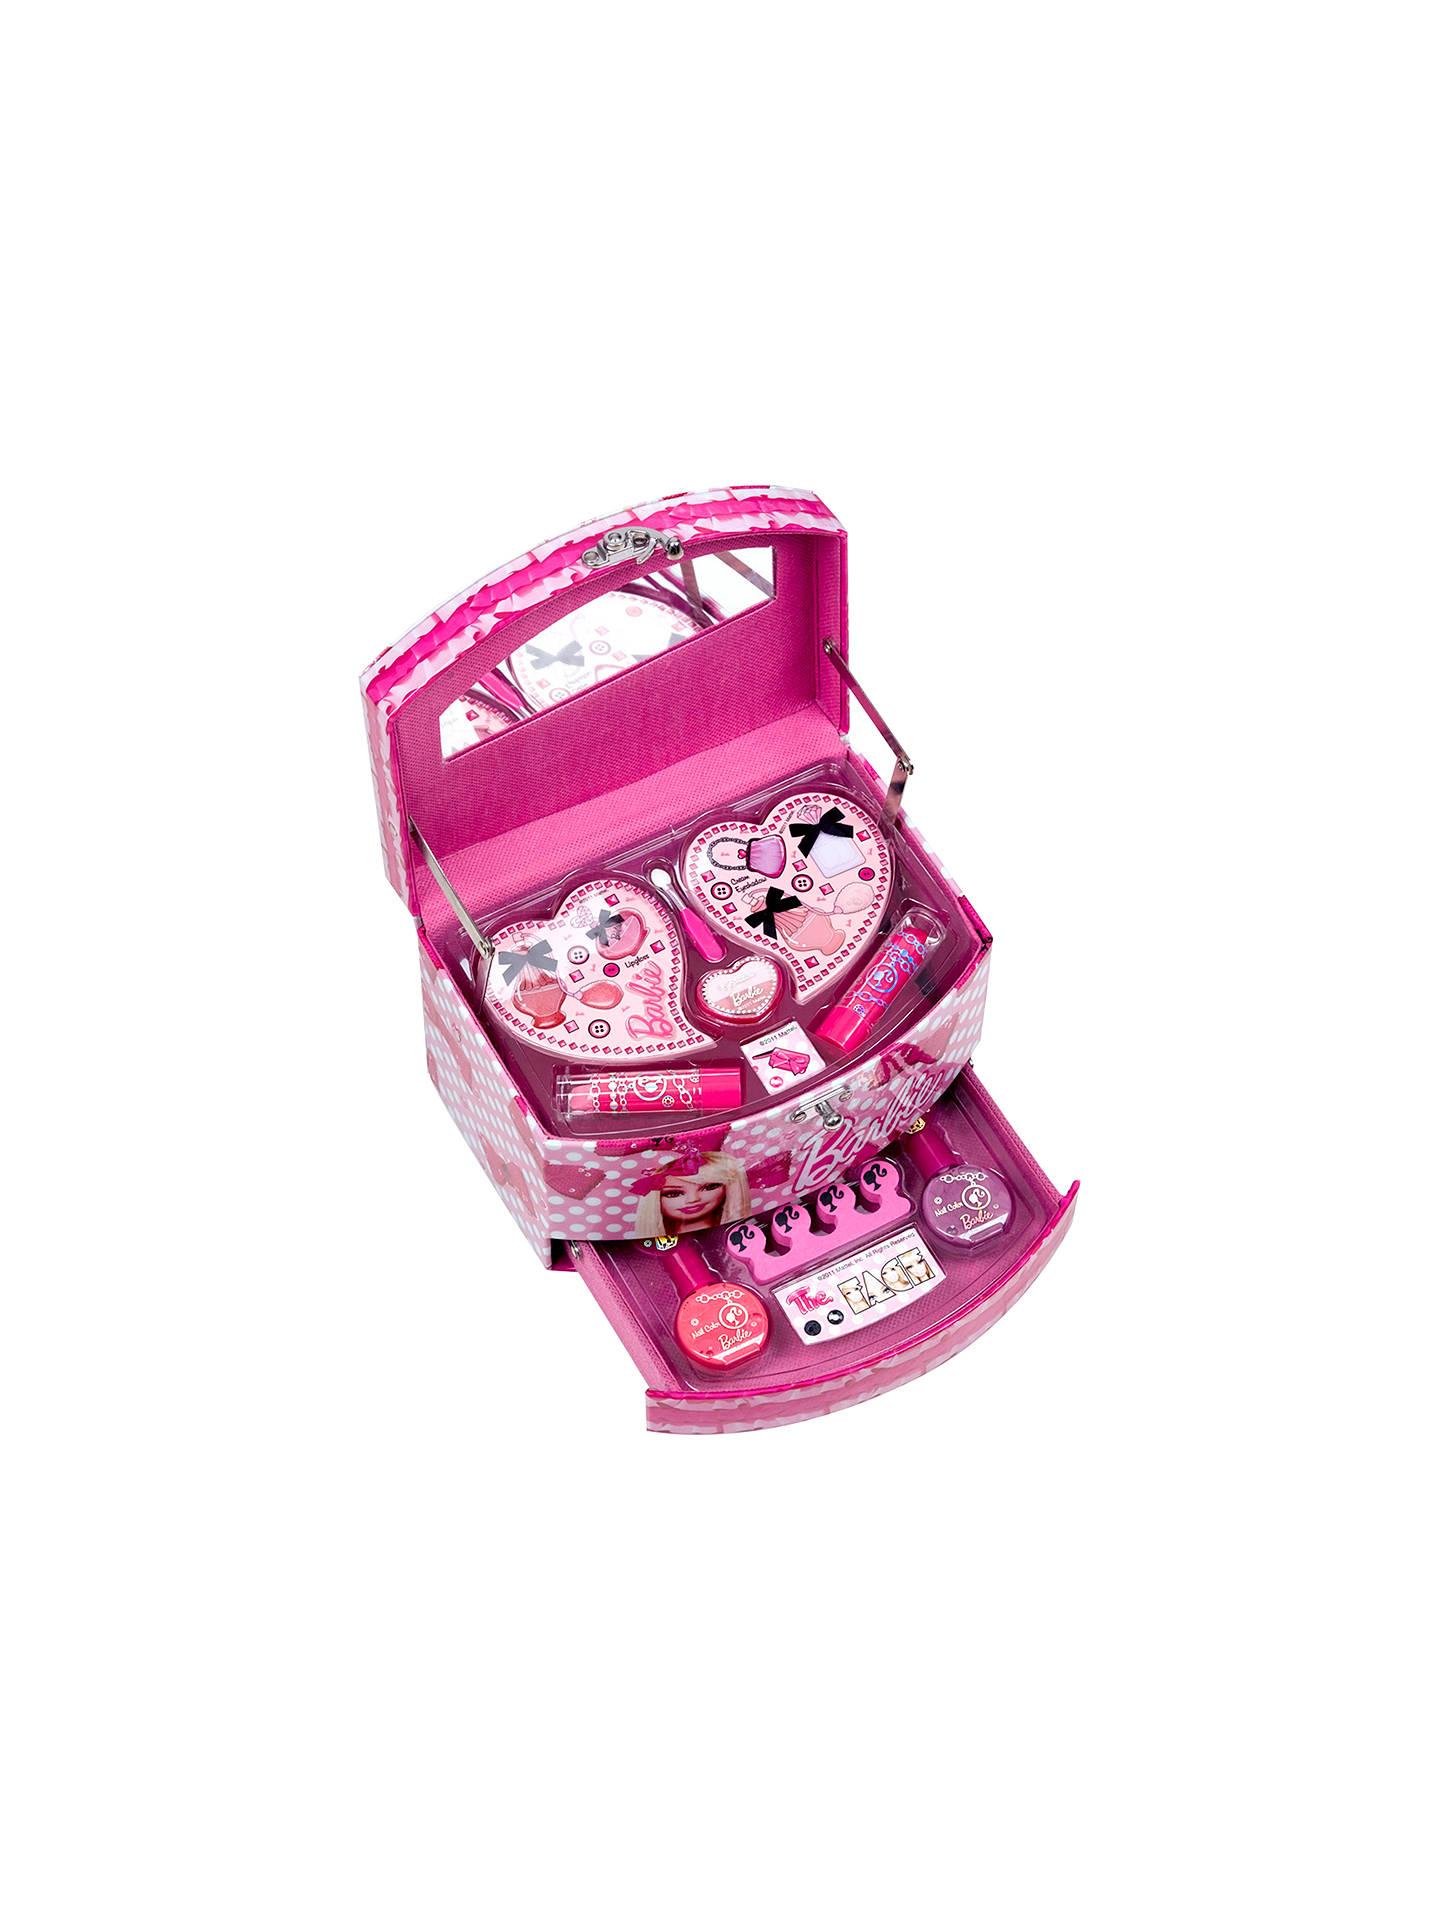 2ae9c10952f1 Barbie Makeup Case at John Lewis & Partners